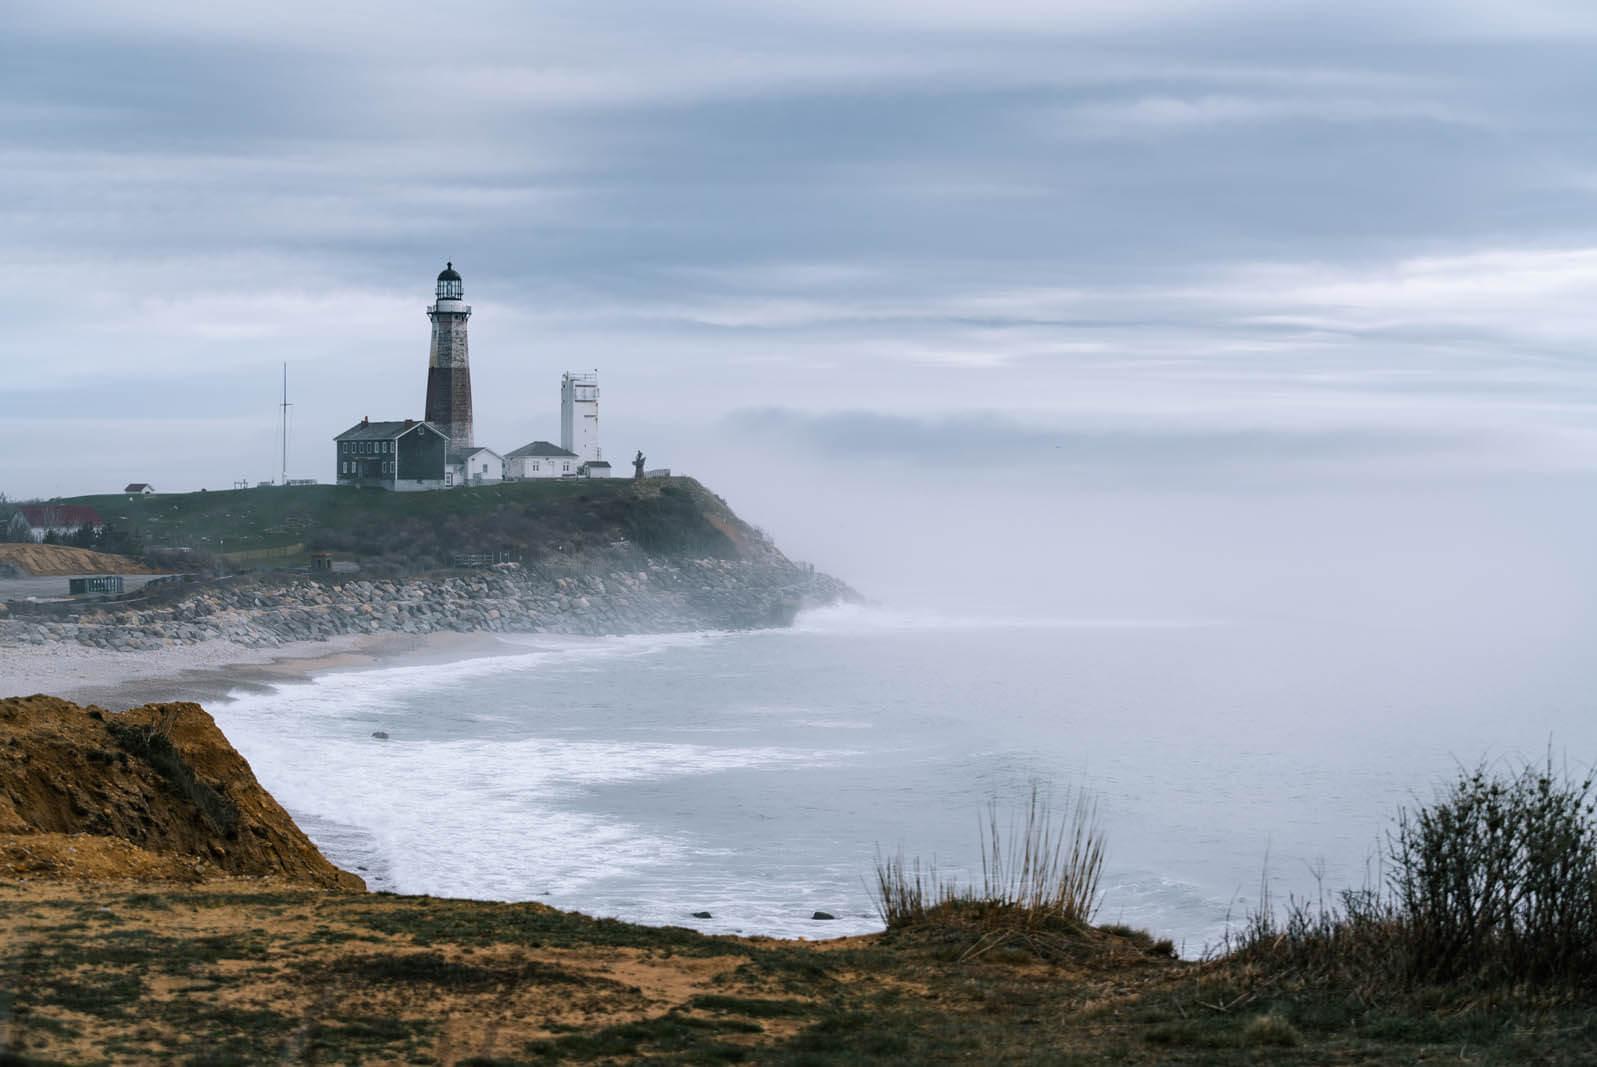 Montauk Point Lighthouse in the Hamptons New York